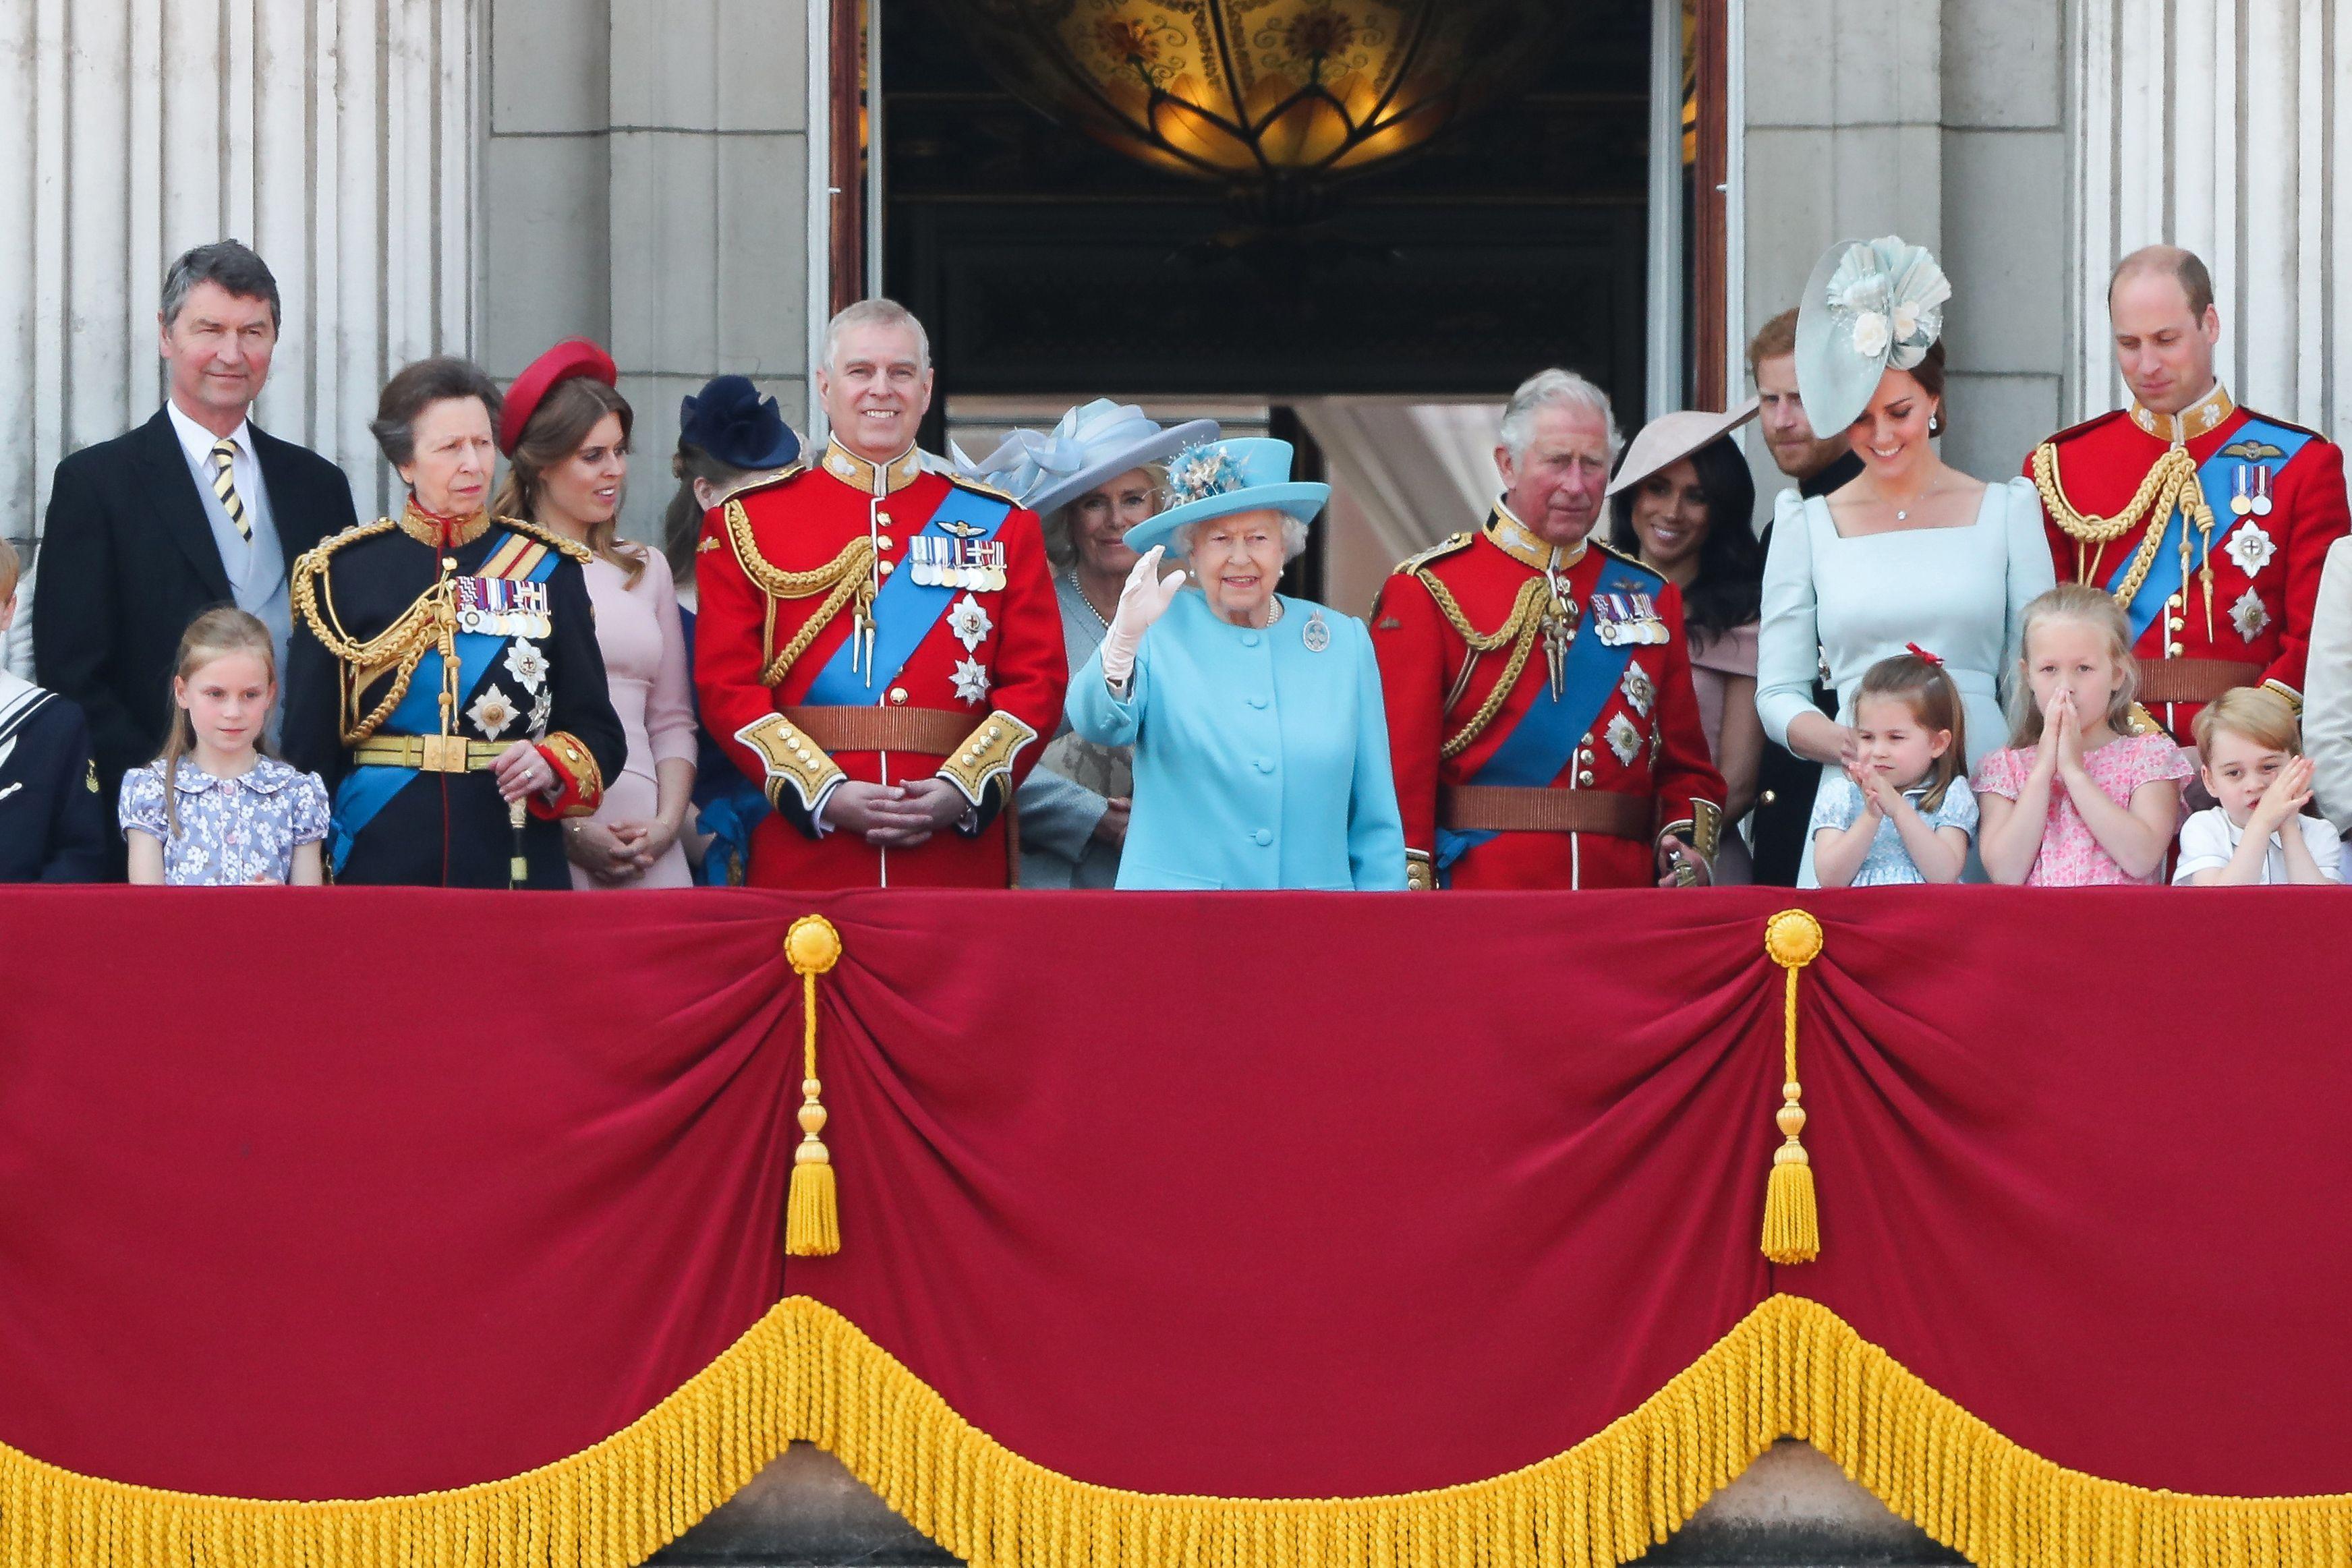 When Is Queen Elizabeth's Birthday Parade in 2019